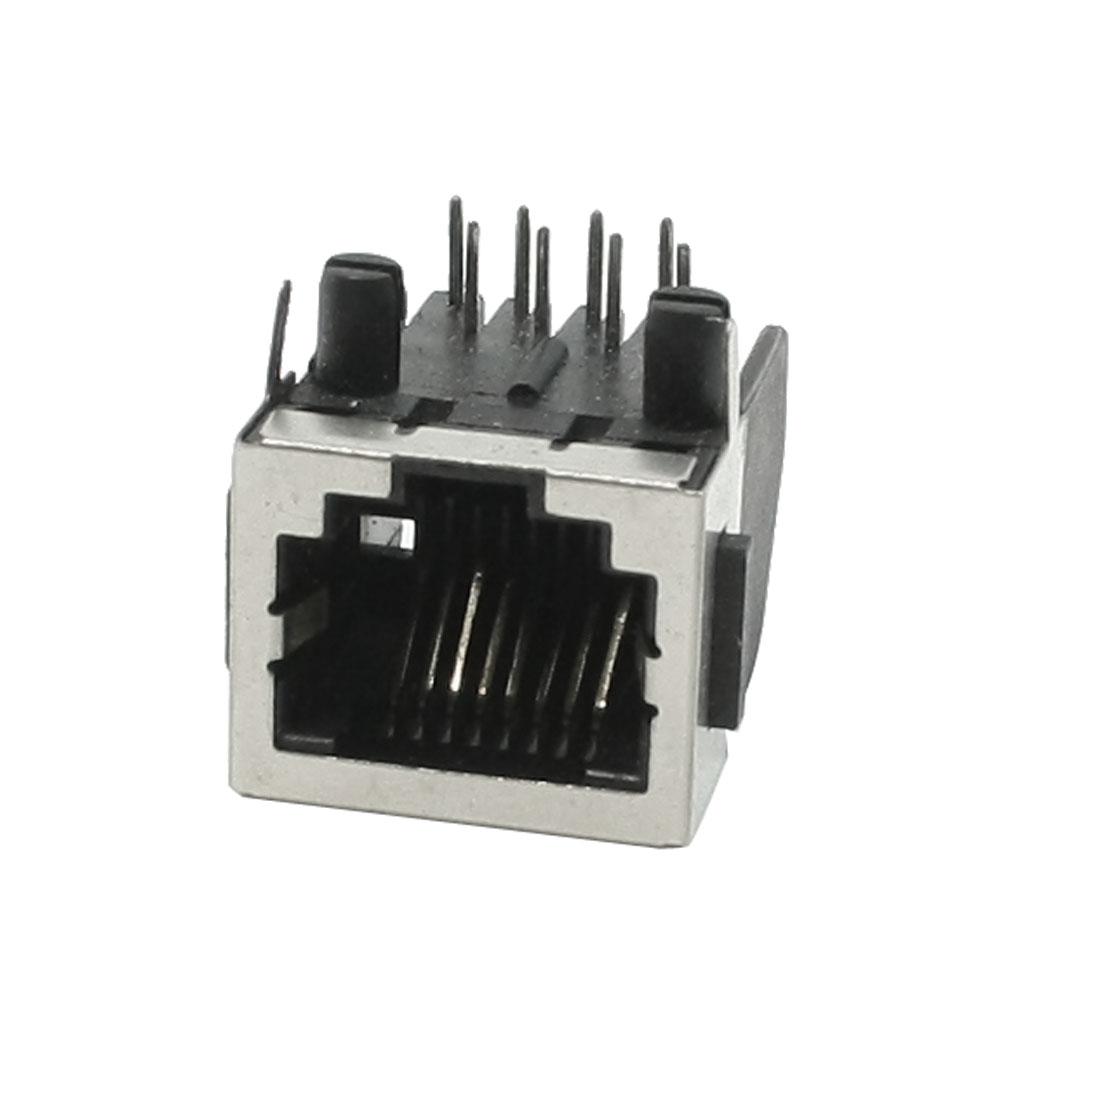 RJ45 8P8C 8 Position Modular Network PCB Jack Socket Port 18mm Length